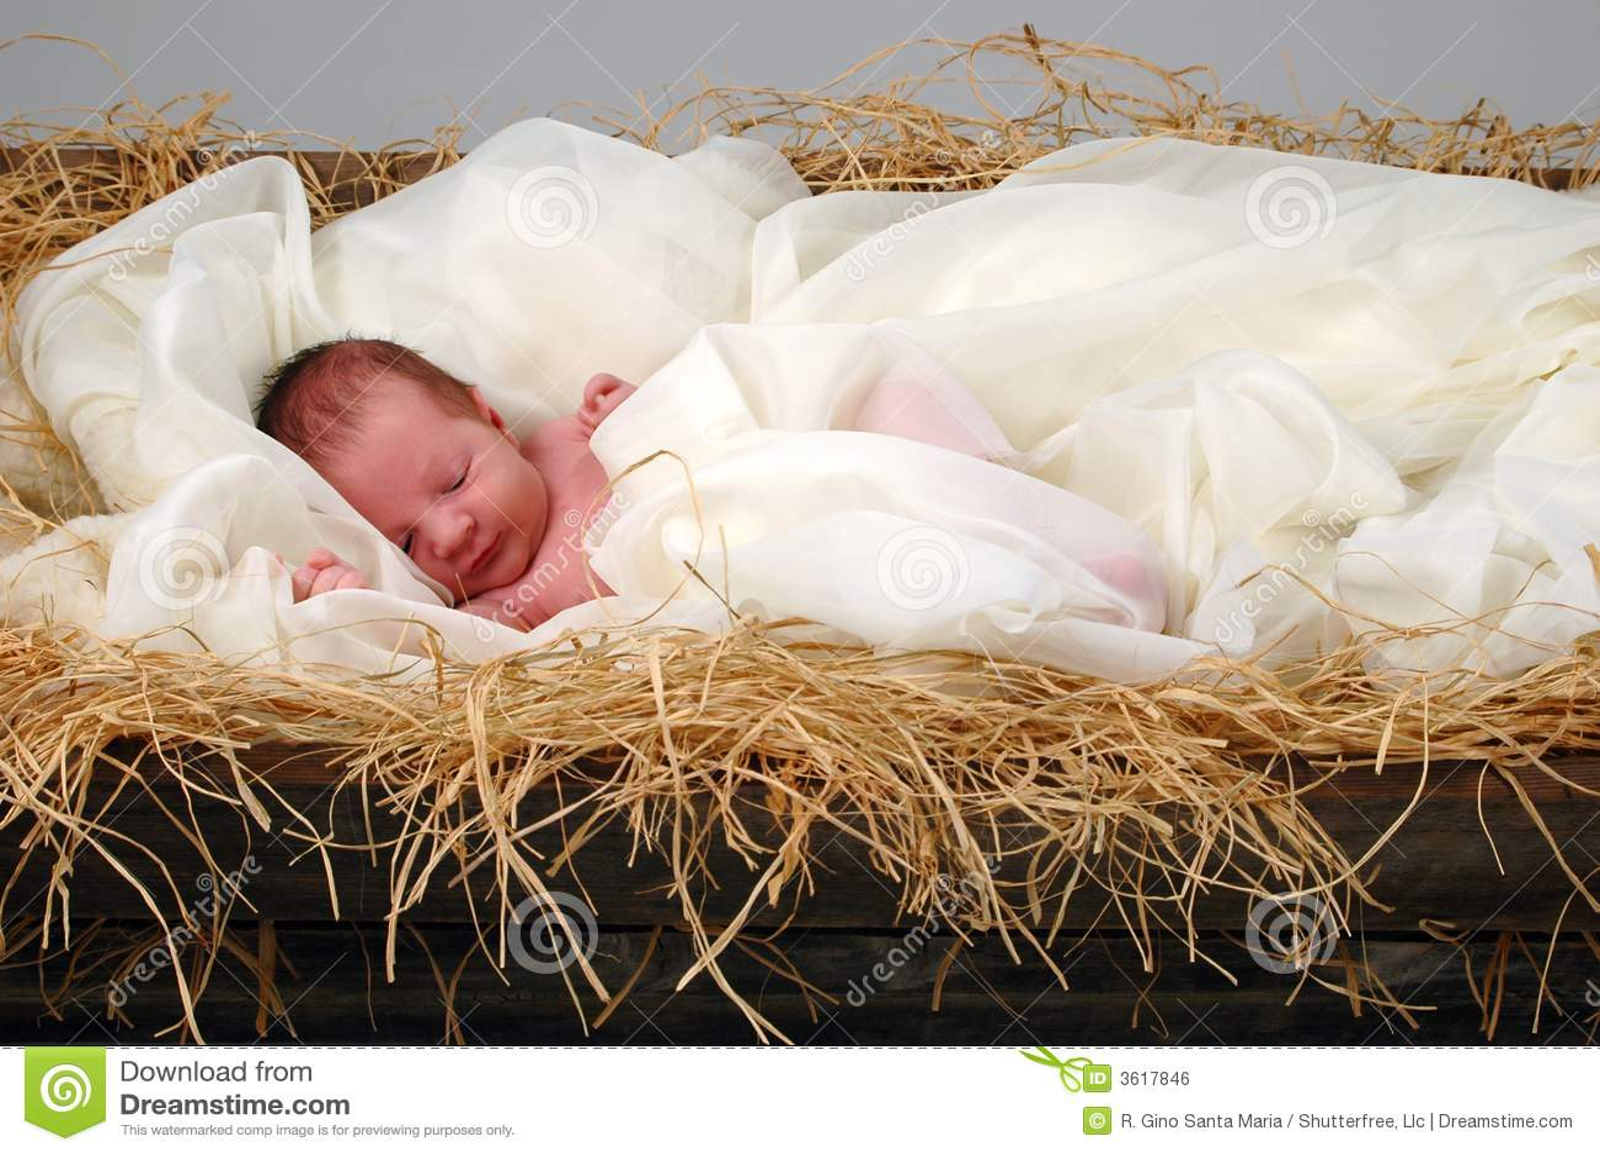 Pictures Jesus Manger Baby Santa